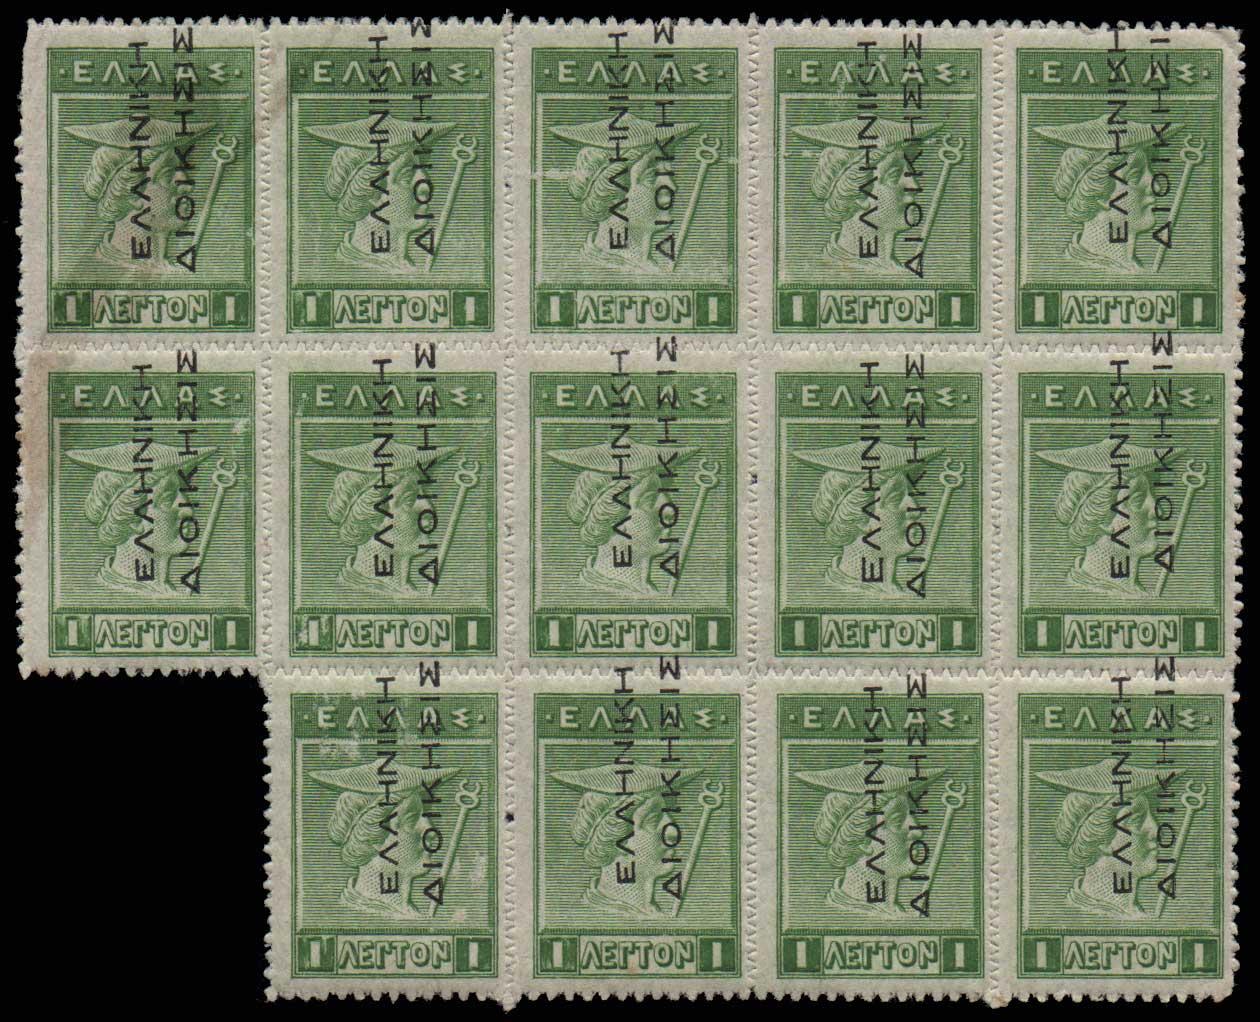 Lot 616 - GREECE-  1911 - 1923 ΕΛΛΗΝΙΚΗΔΙΟΙΚΗΣΙΣ -  Athens Auctions Public Auction 63 General Stamp Sale